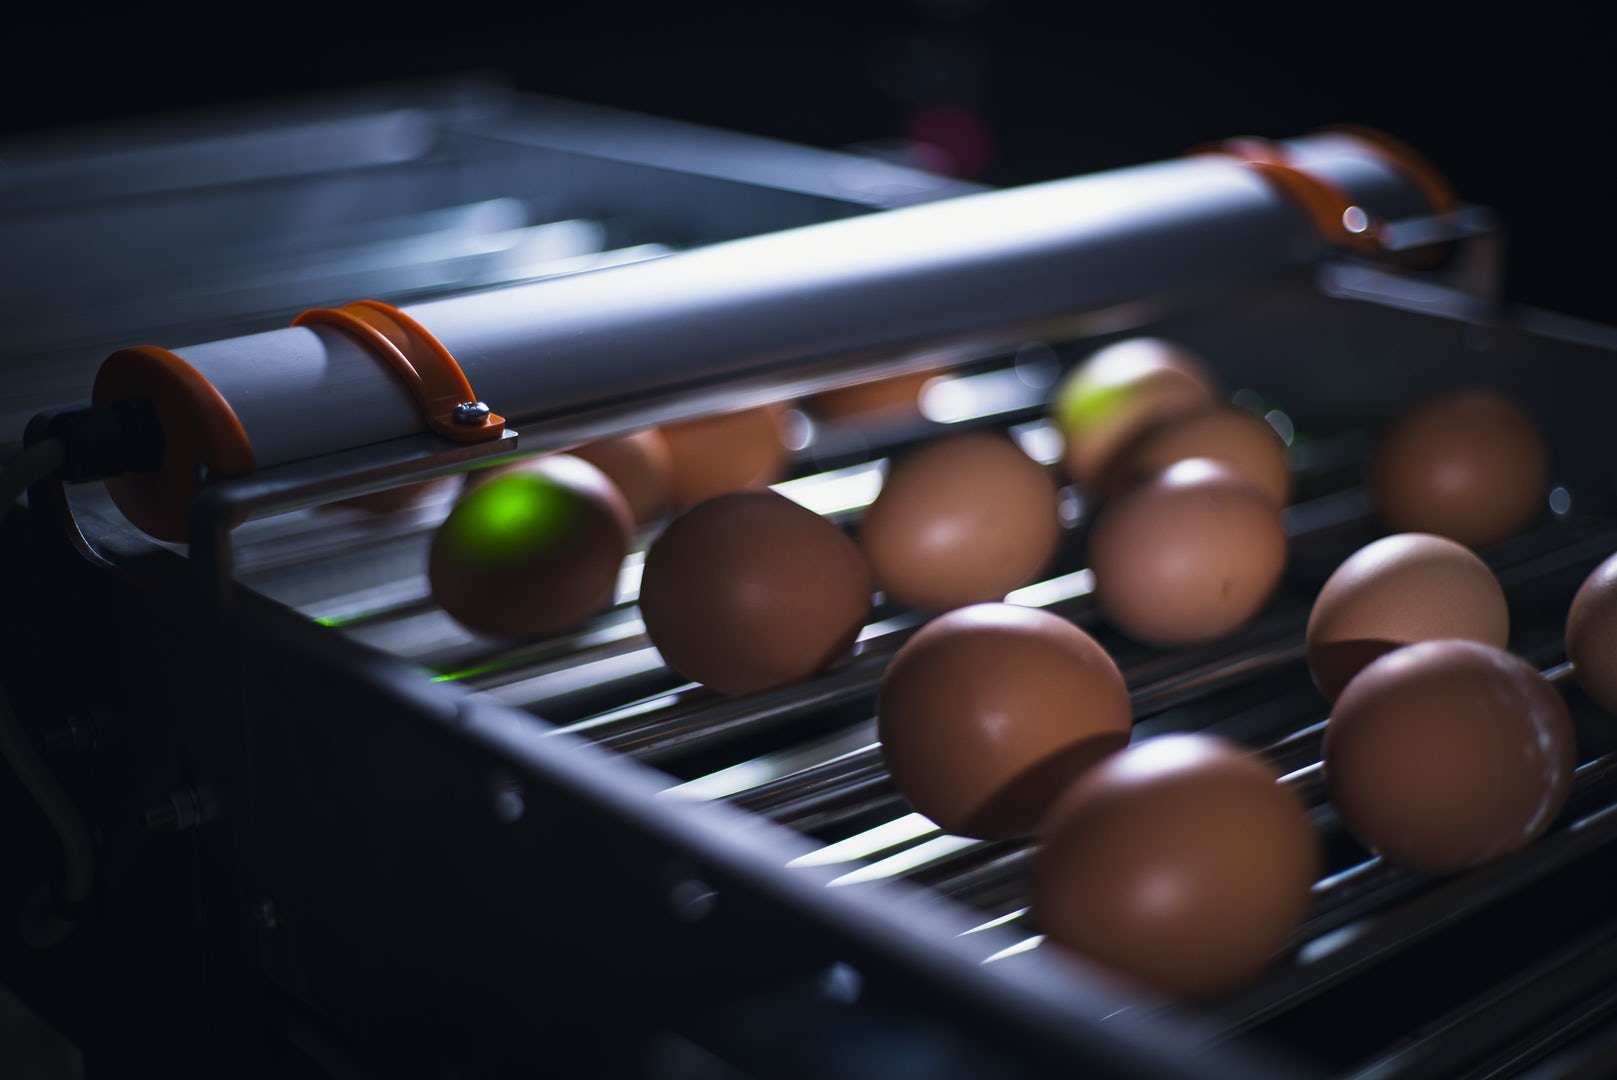 Egg Xact Egg counter MV 04146